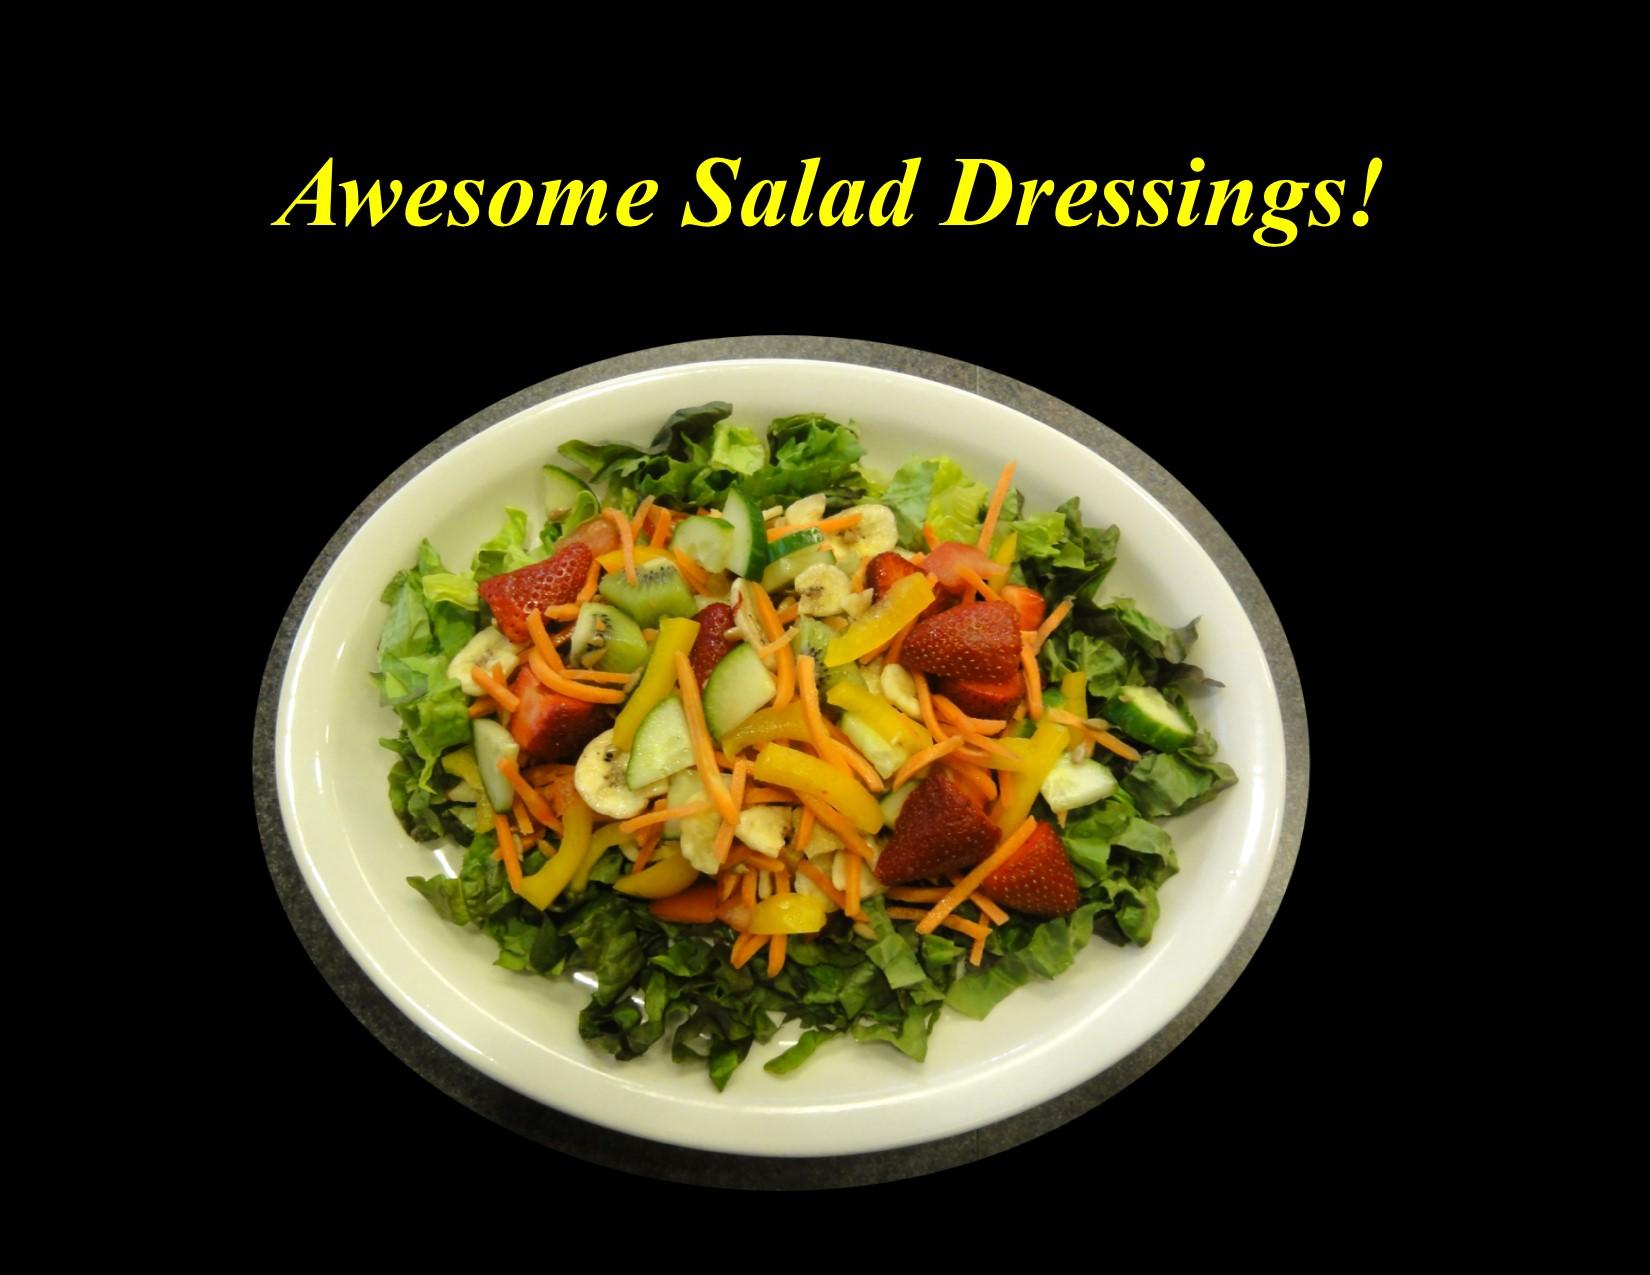 (Virtual) Tasty Tuesdays: Awesome Salad Dressings